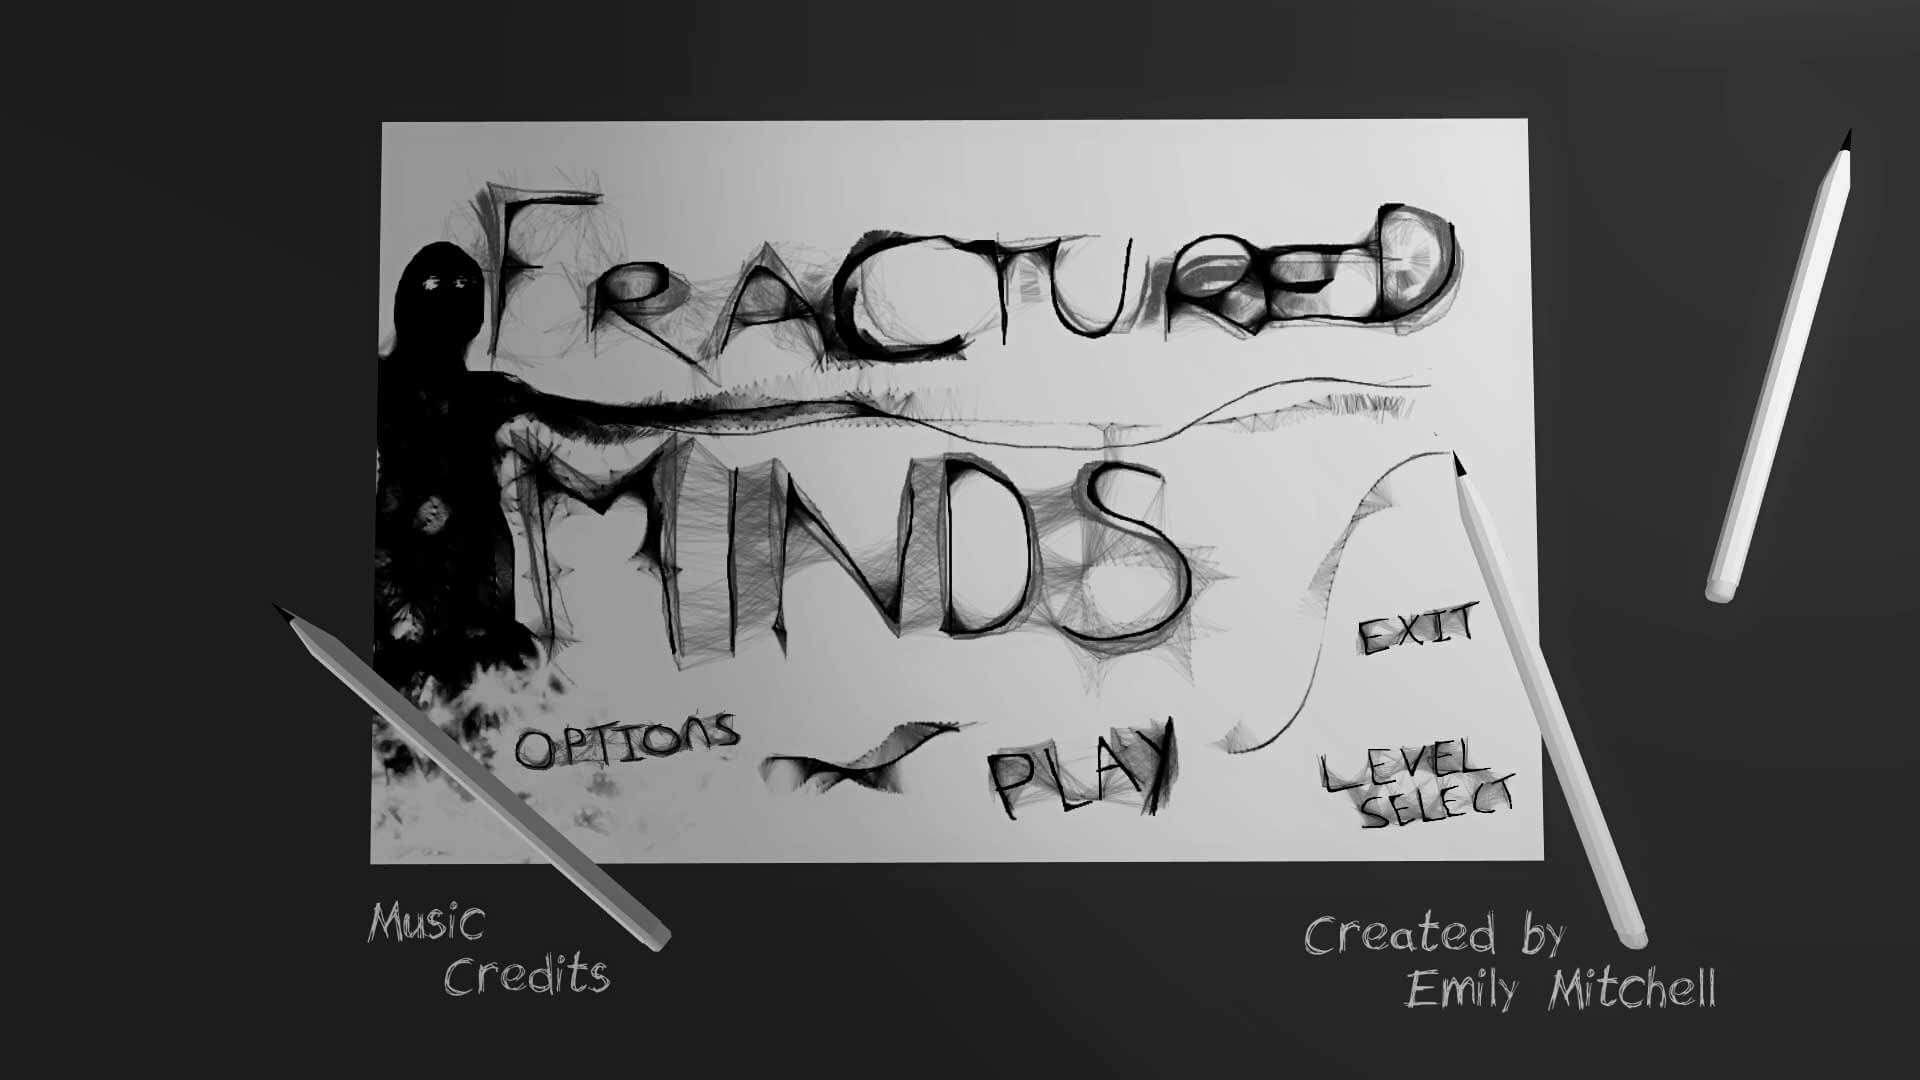 Fractured Minds | ROW (fb4ebd2a-51c7-4435-8fda-6df539fdb1d3)